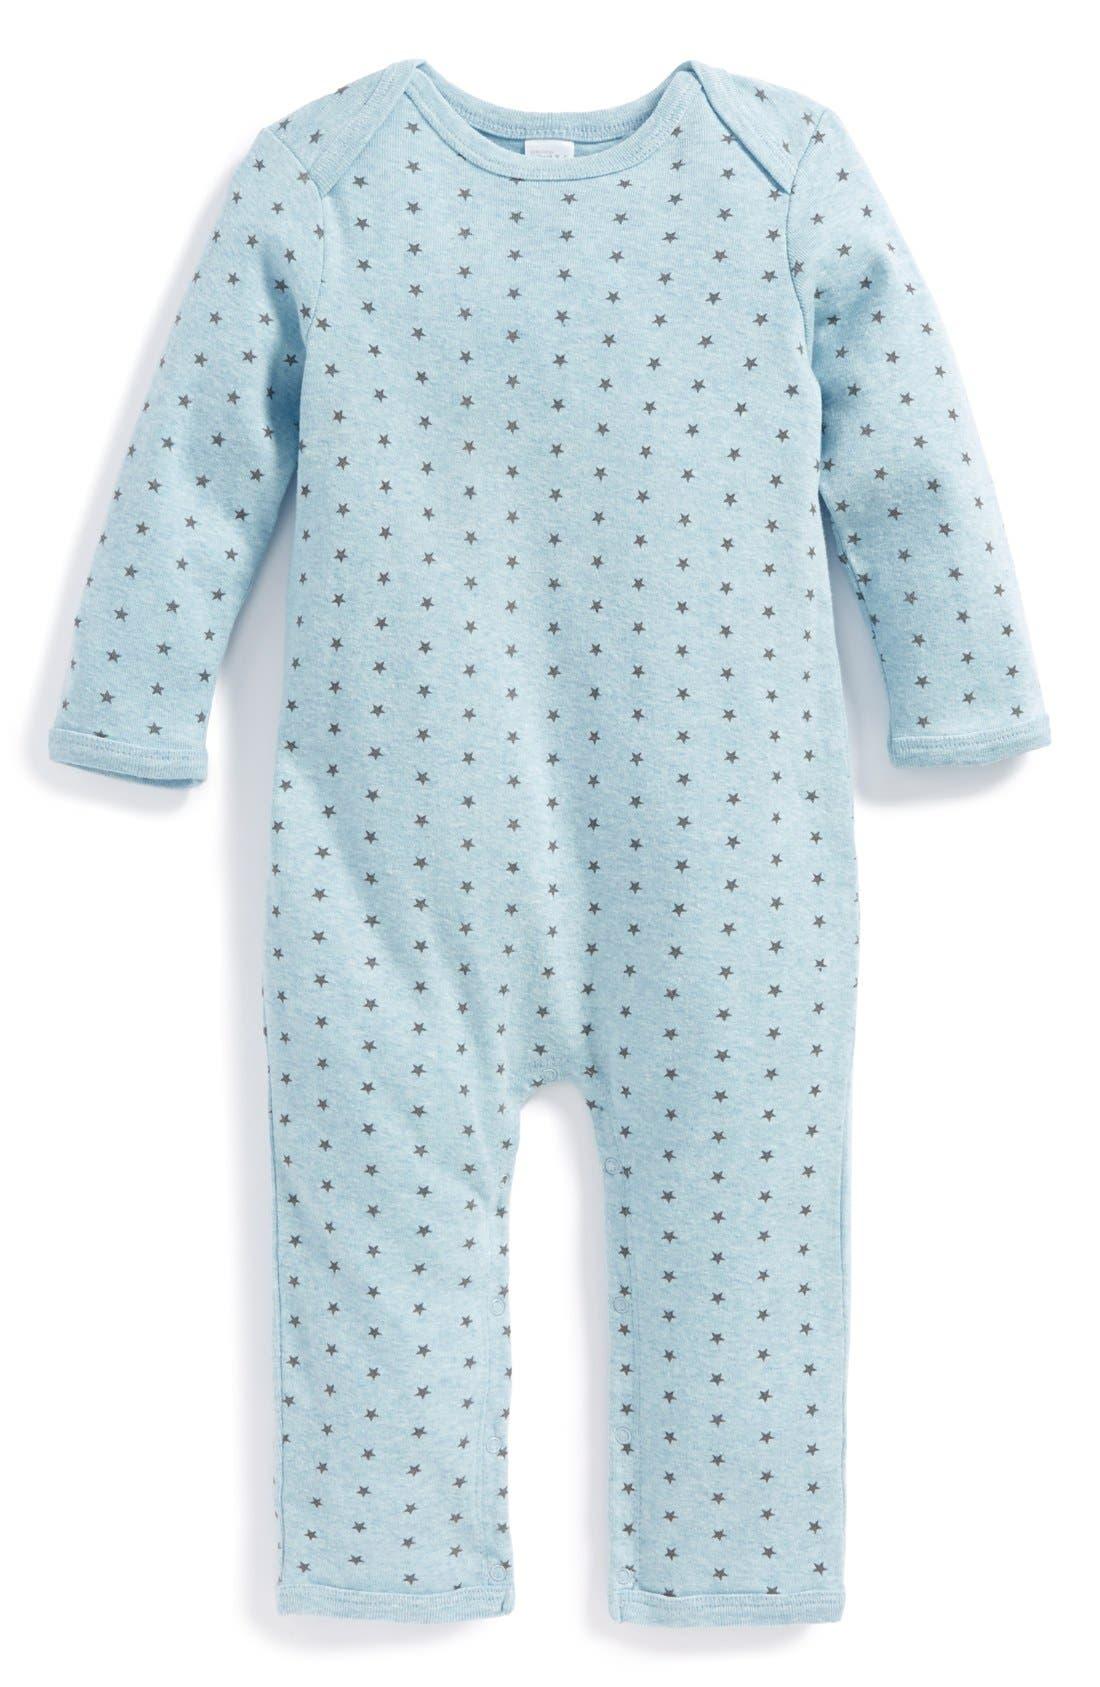 Alternate Image 1 Selected - Nordstrom Baby Print Romper (Baby)